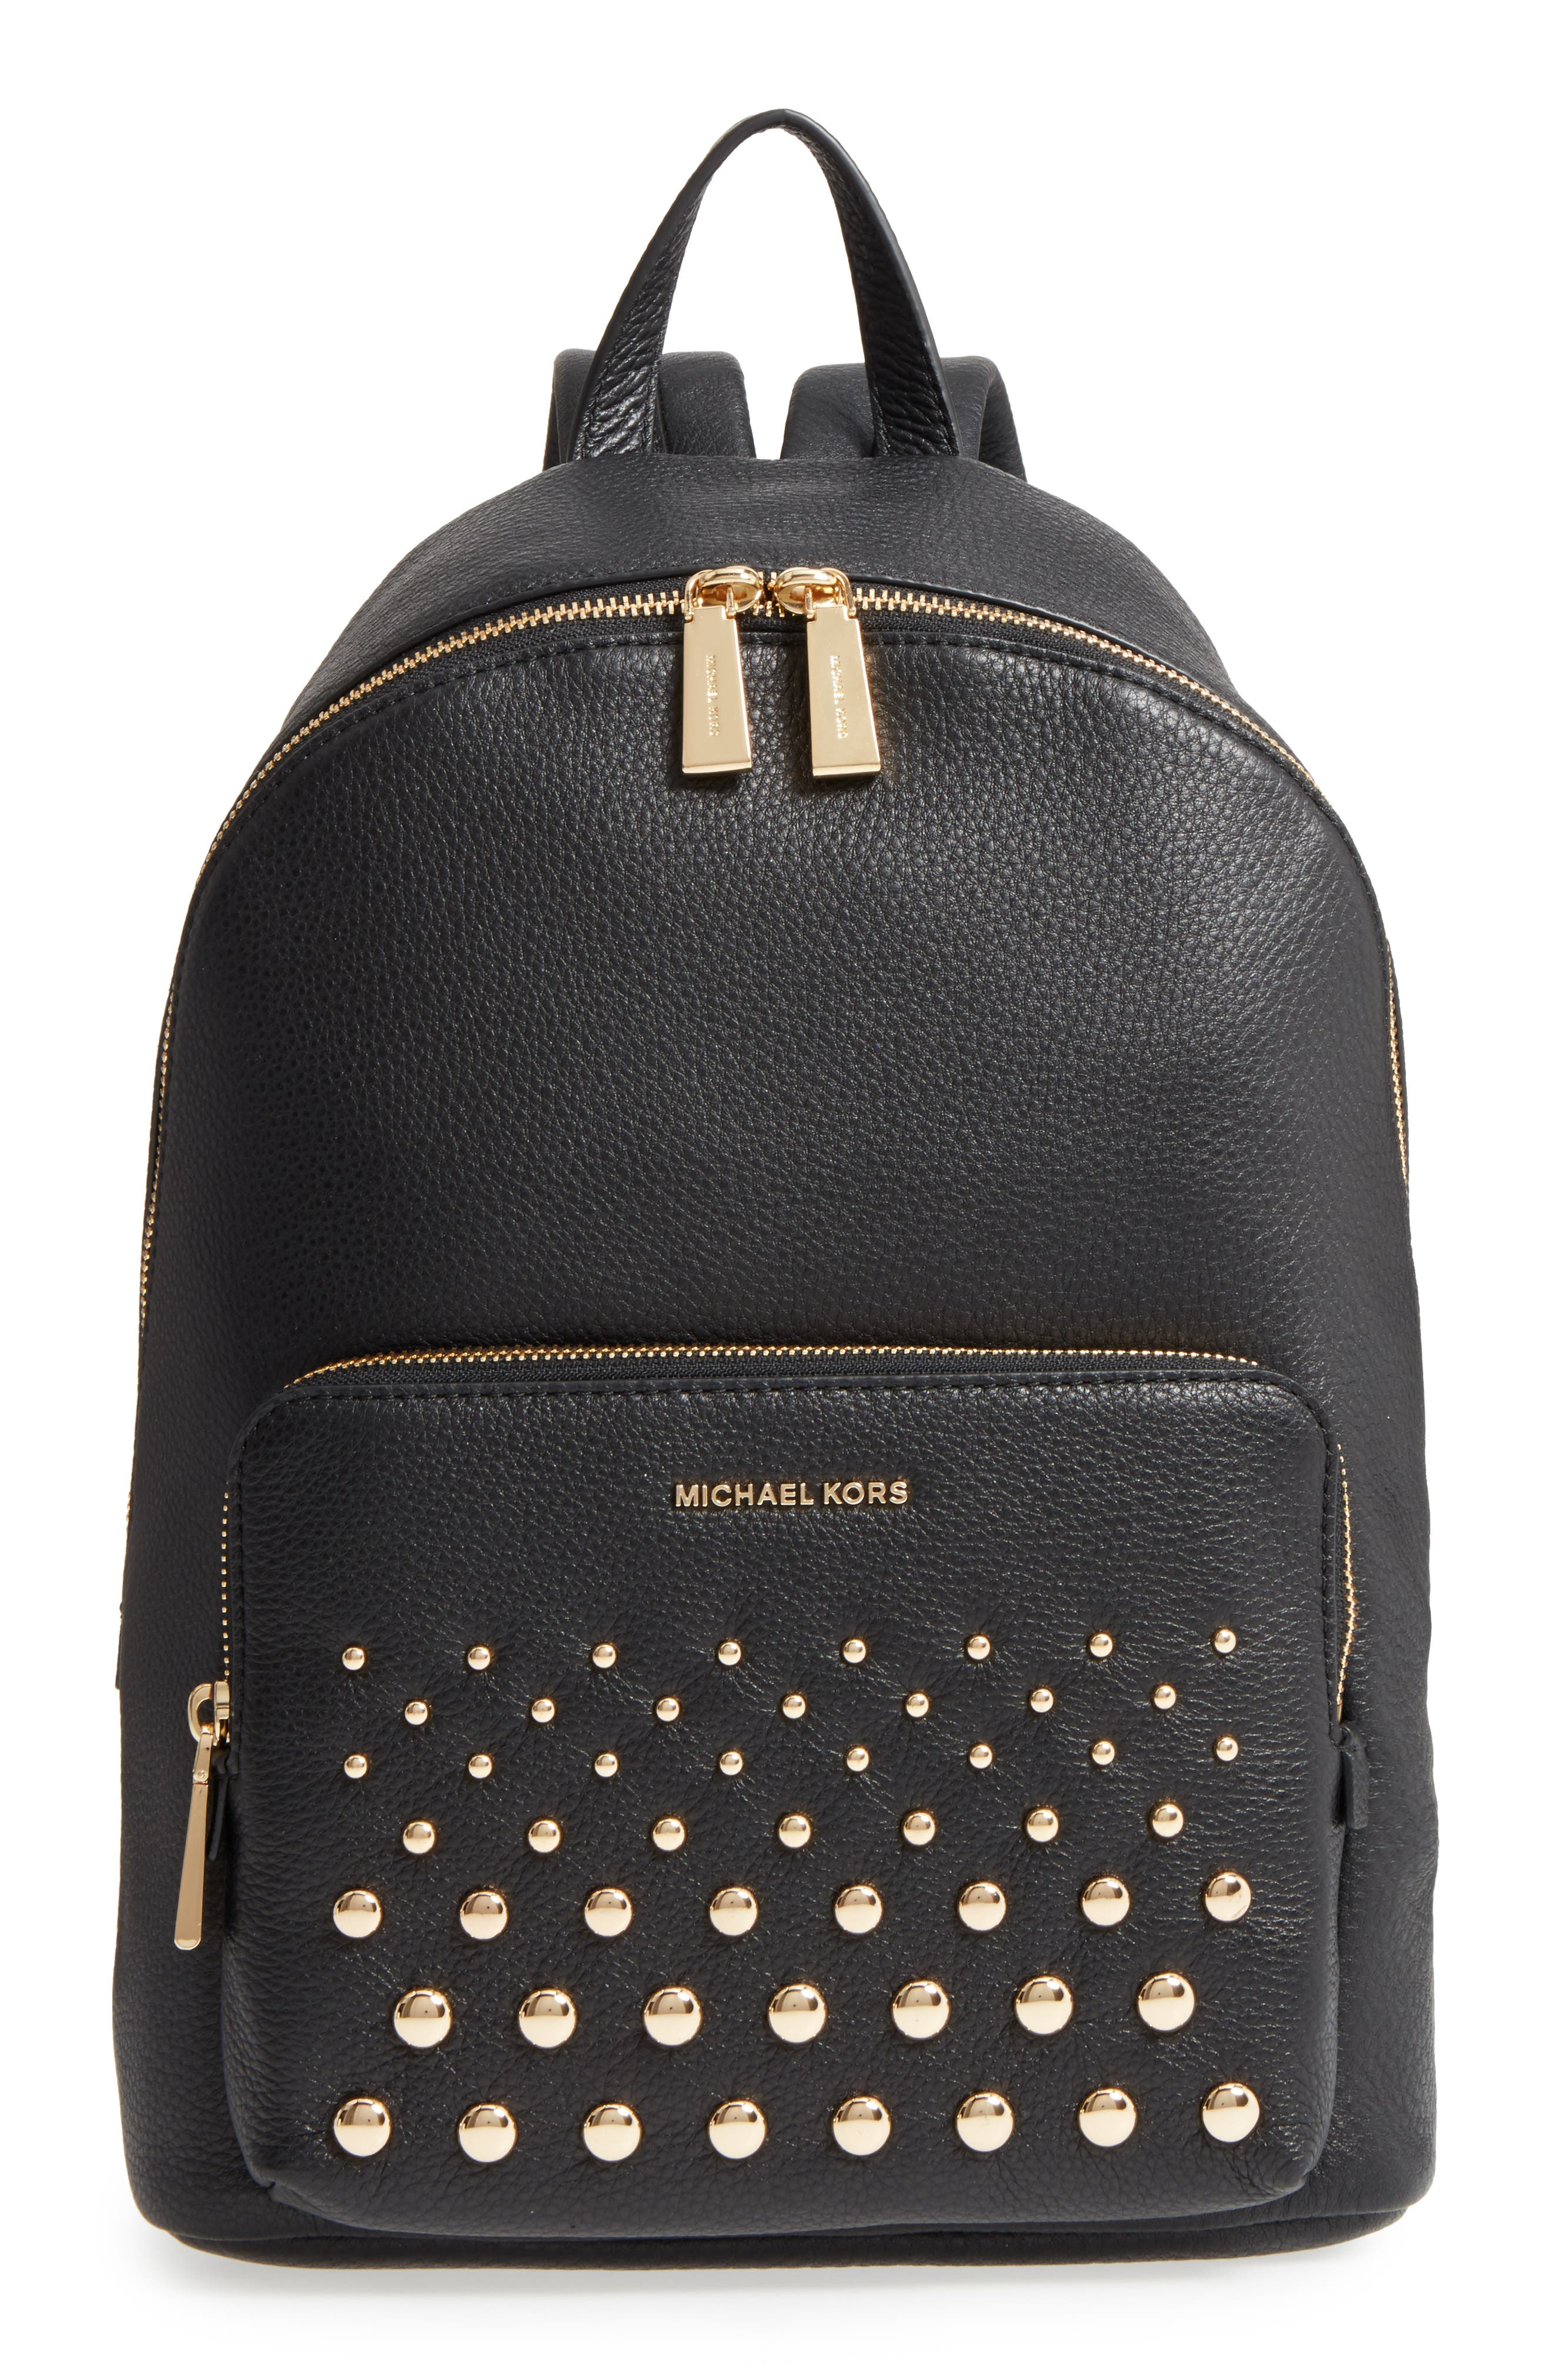 Michael Kors Large Wythe Studded Leather Backpack